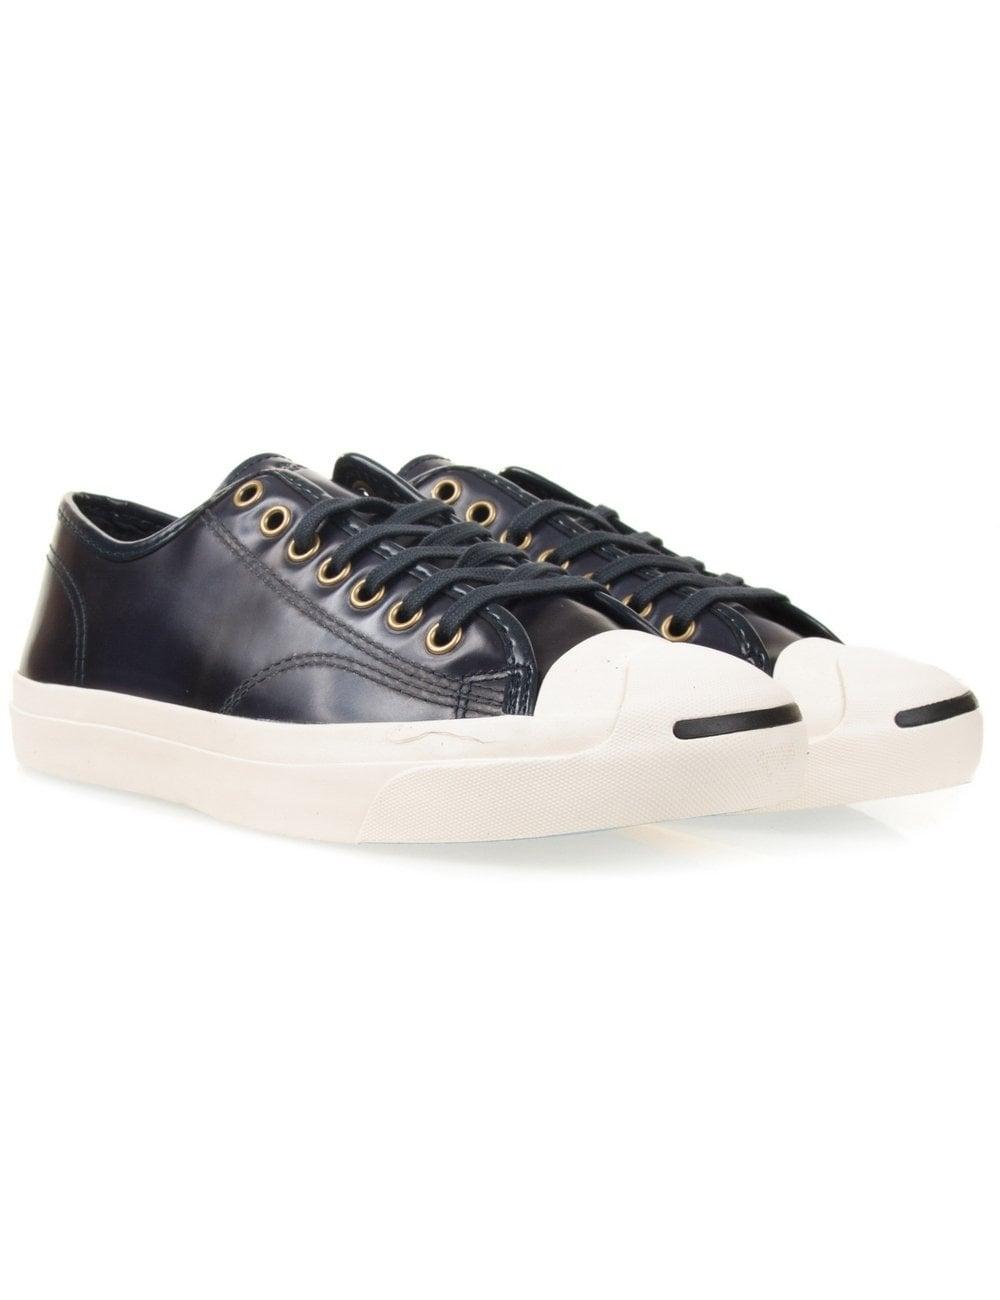 3a31ca7944ec Converse Jack Purcell LTT OX Shoes - Victorian Blue - Footwear from ...